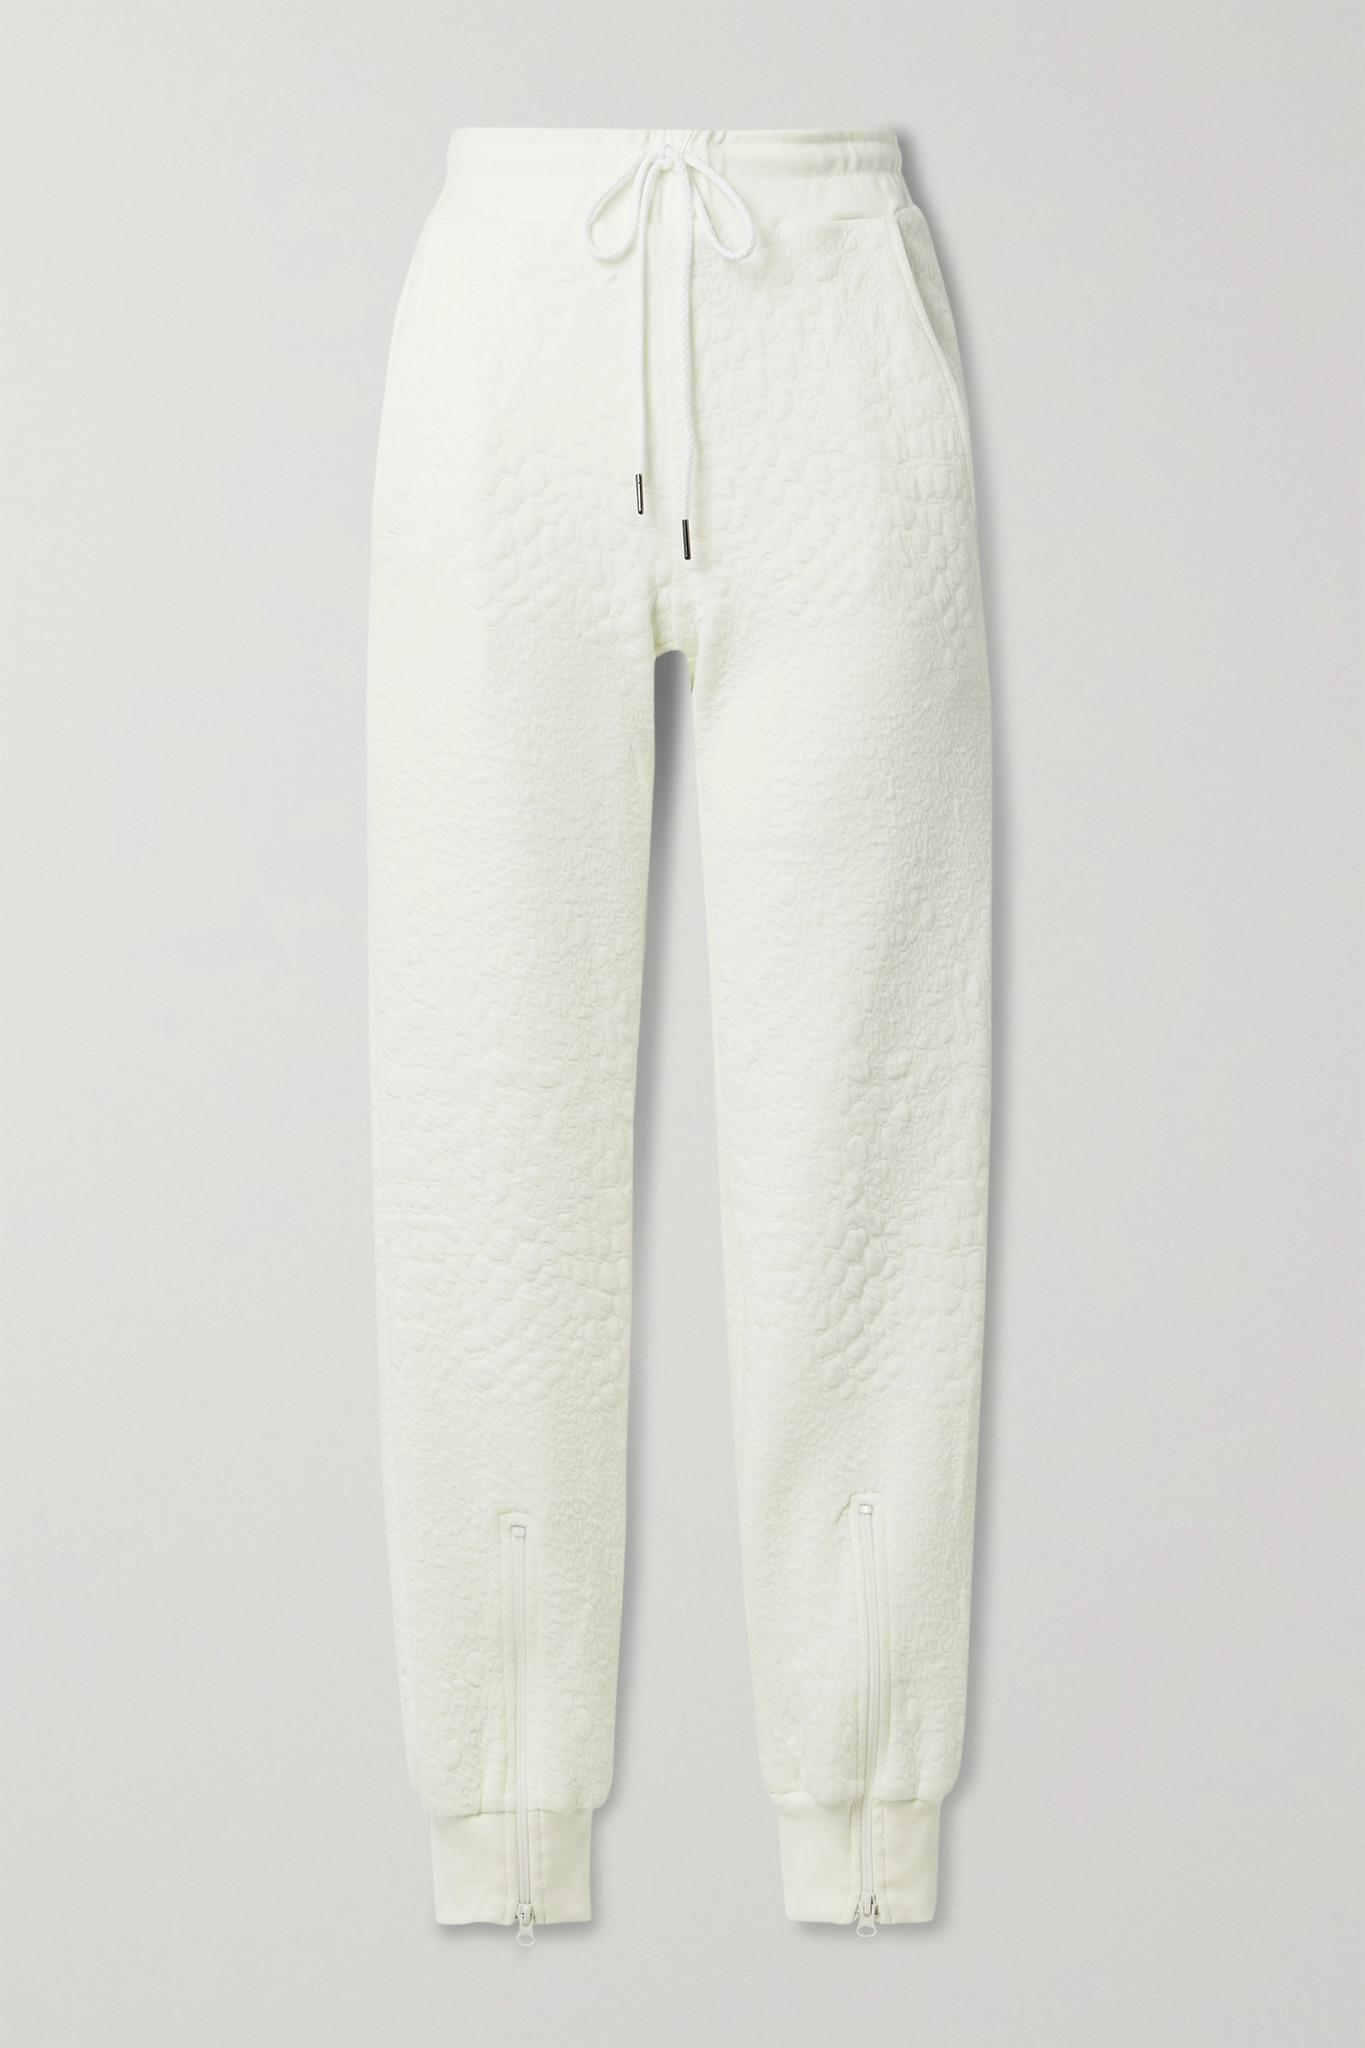 TWENTY MONTRÉAL - Caiman Textured-jersey Track Pants - Ecru - small